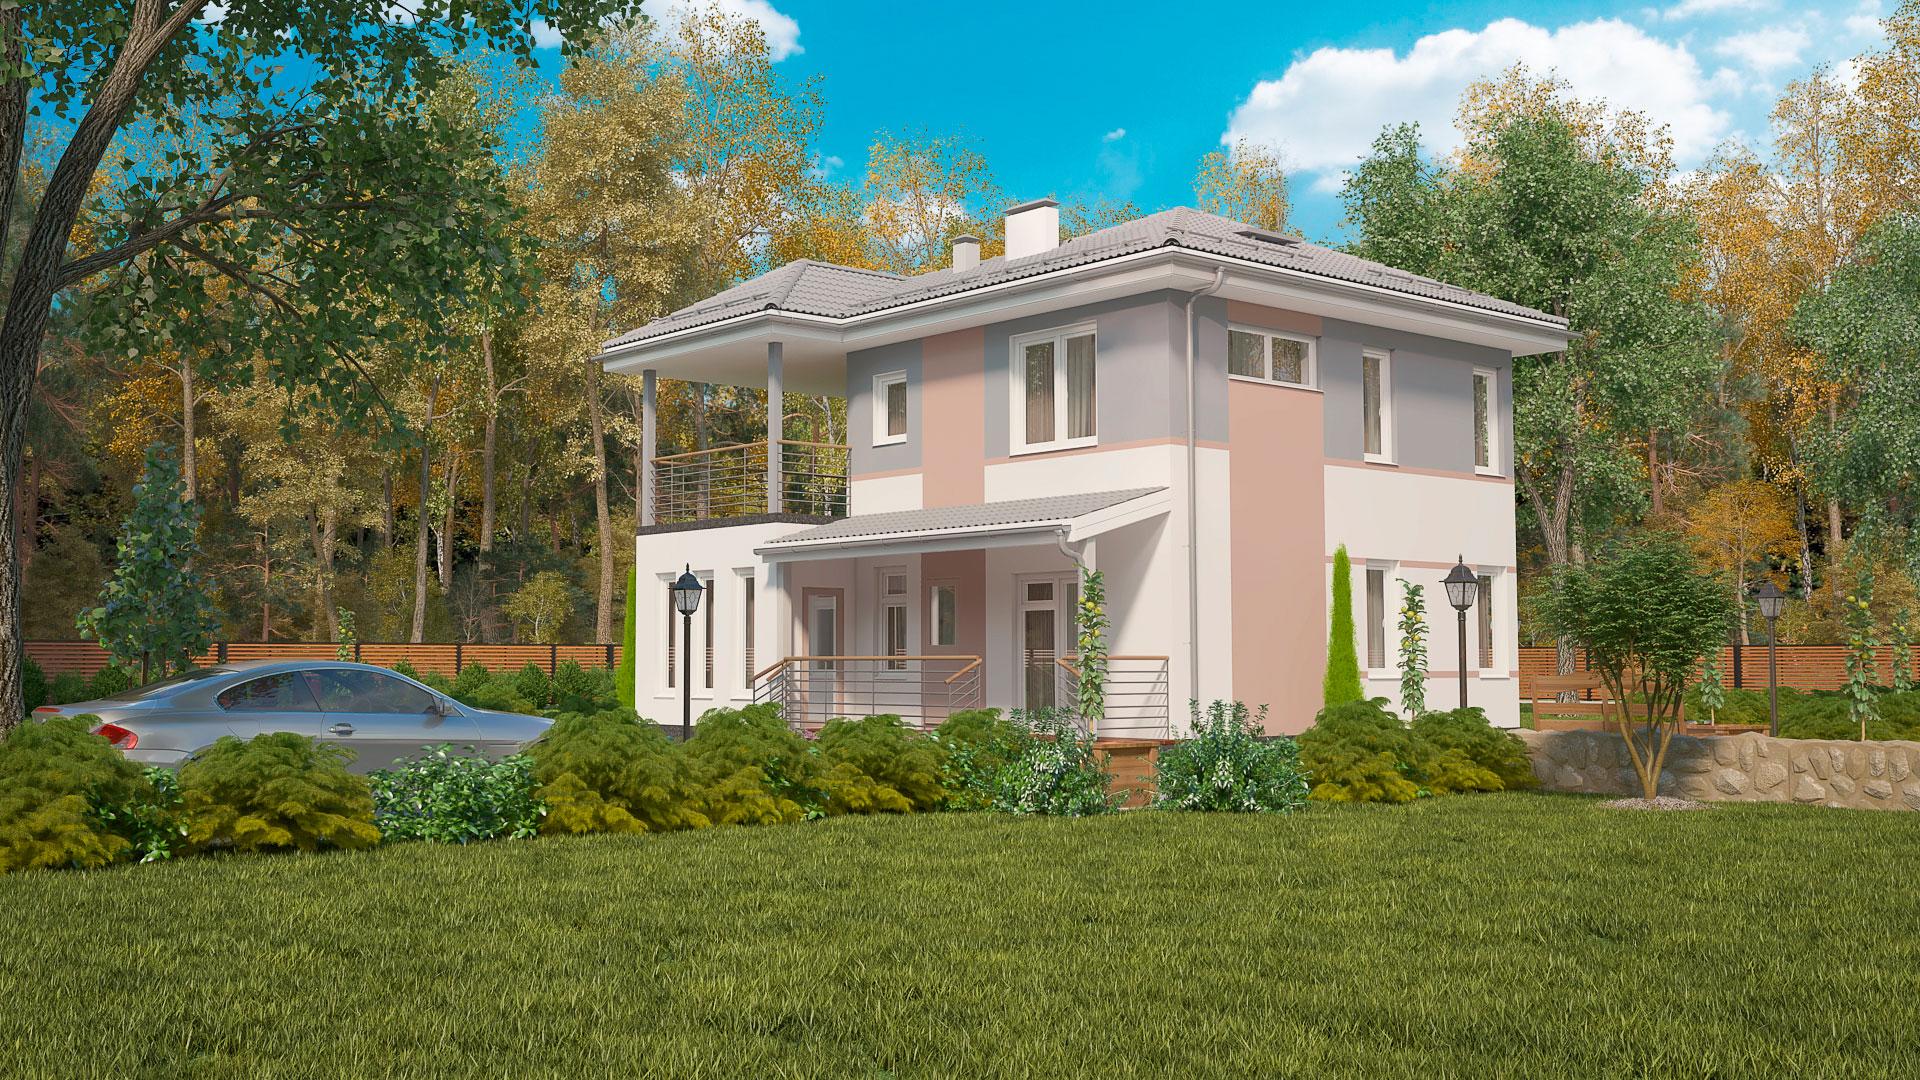 Задний фасад двухэтажного дома БЭНПАН, проект МС-176/3.